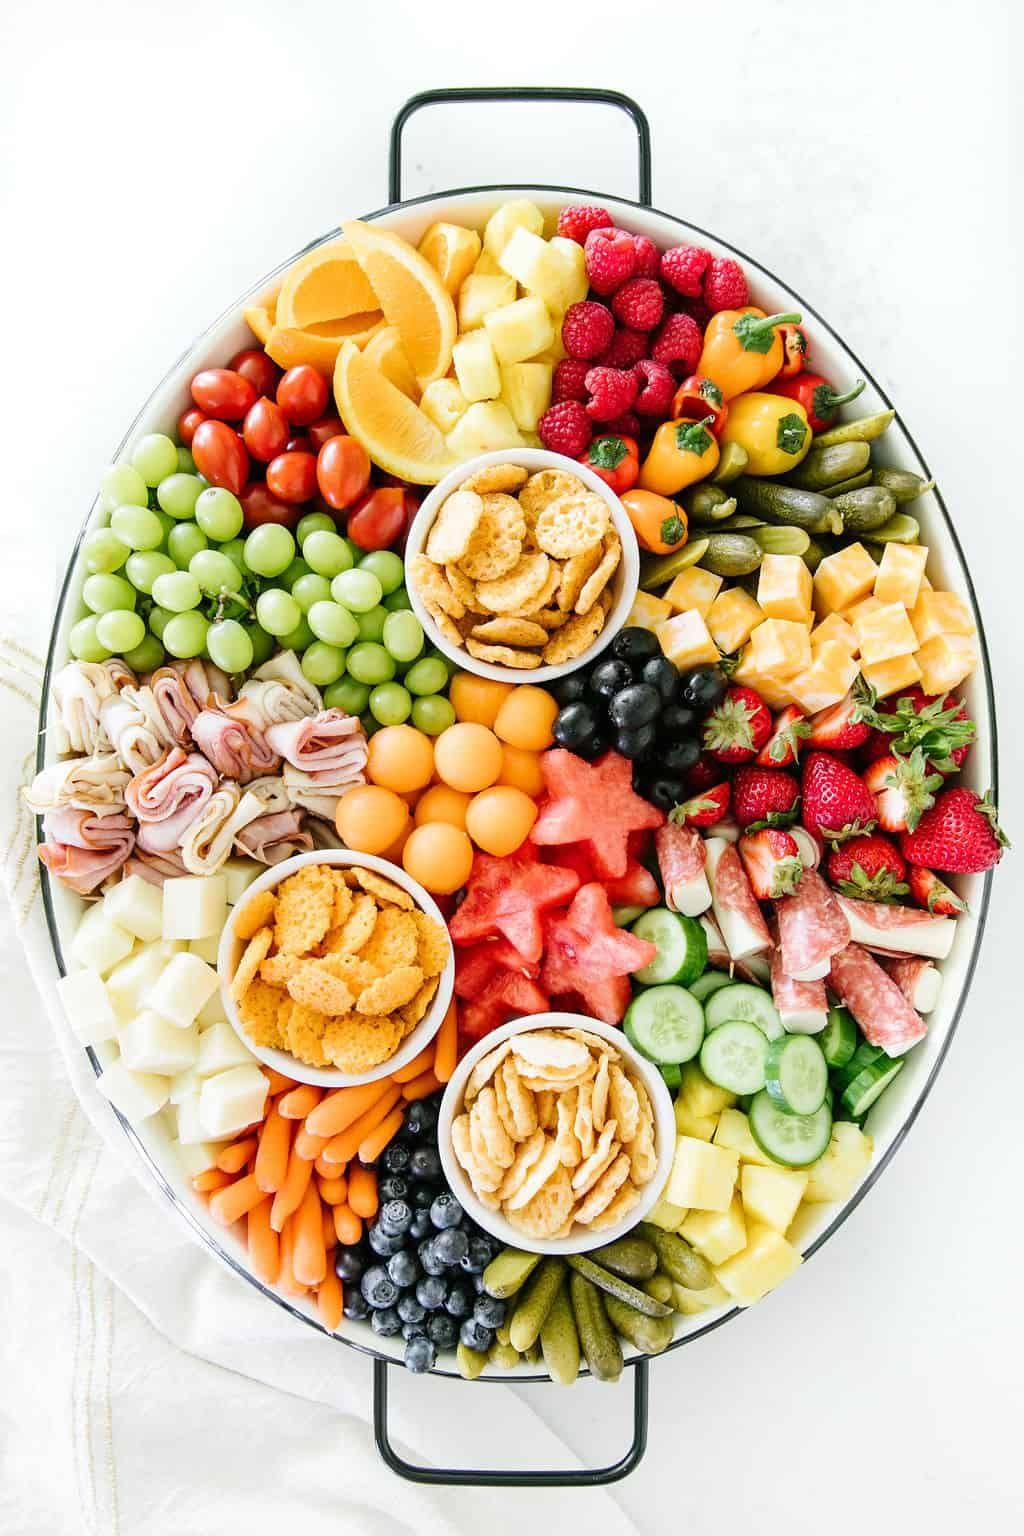 Kid Friendly Summer Snack Platter (gluten free) | Clean Eats & Treats – Carey&CleanEatingS